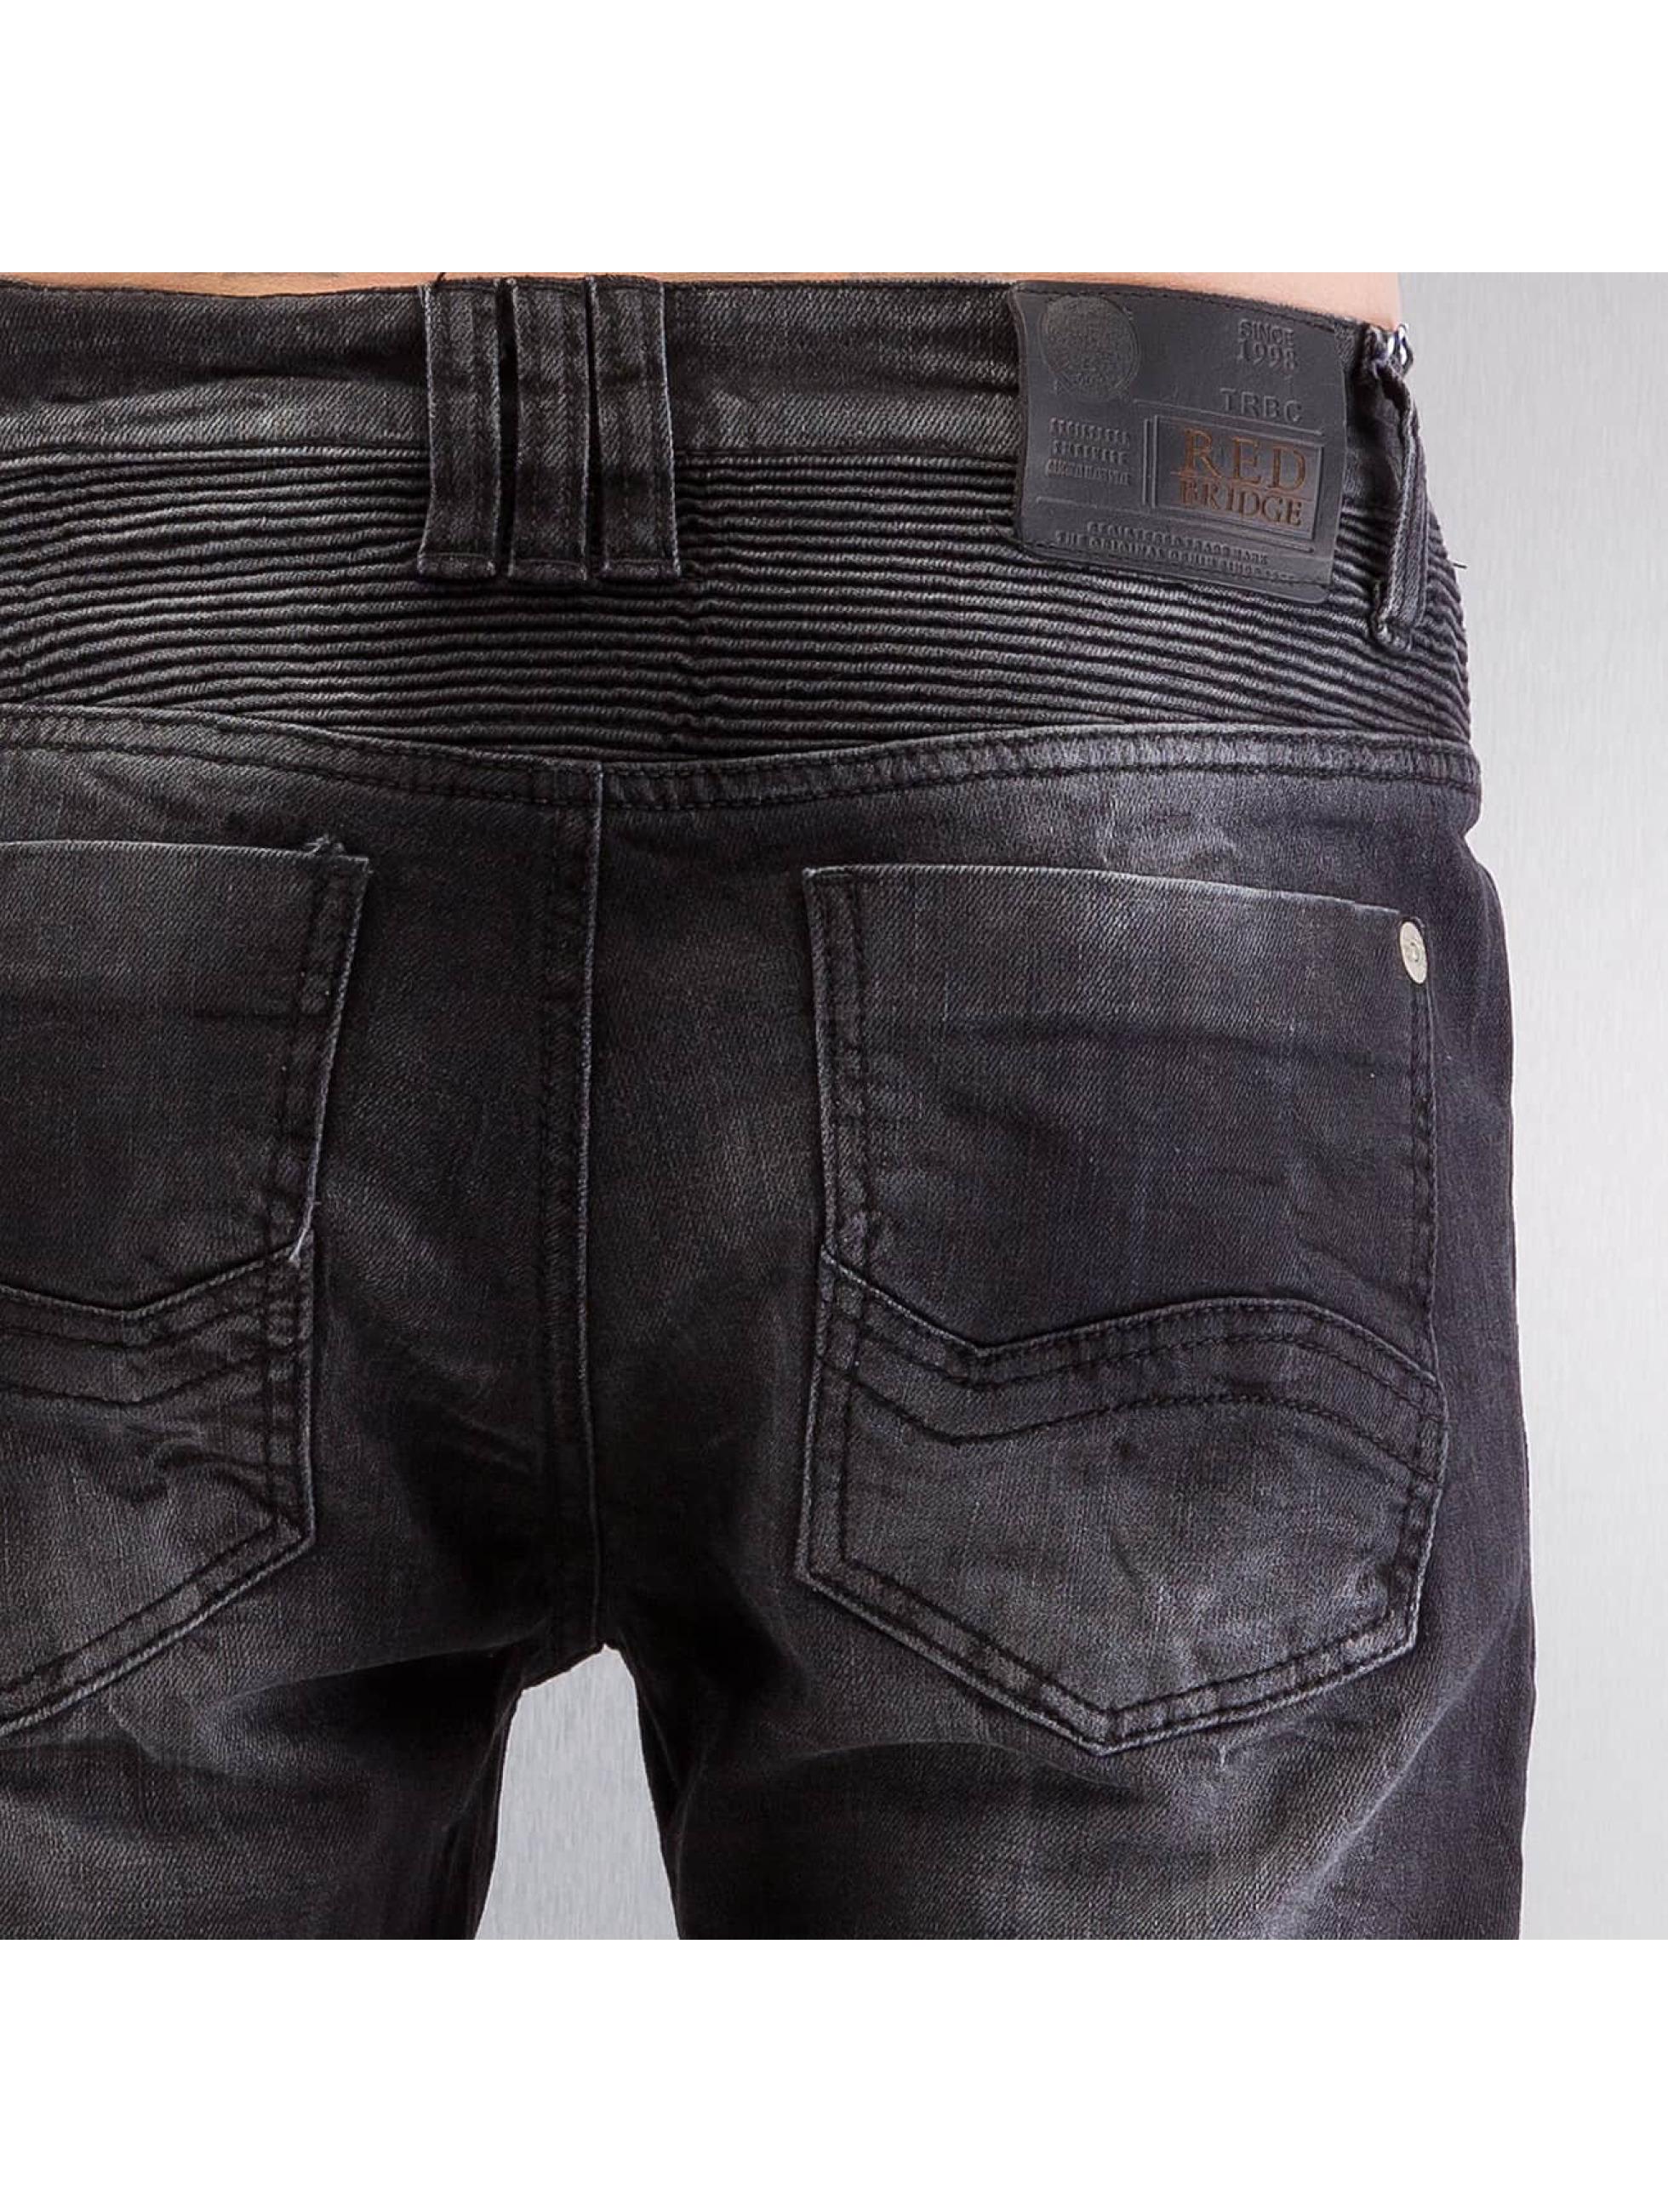 Red Bridge Slim Fit Jeans Quilted black